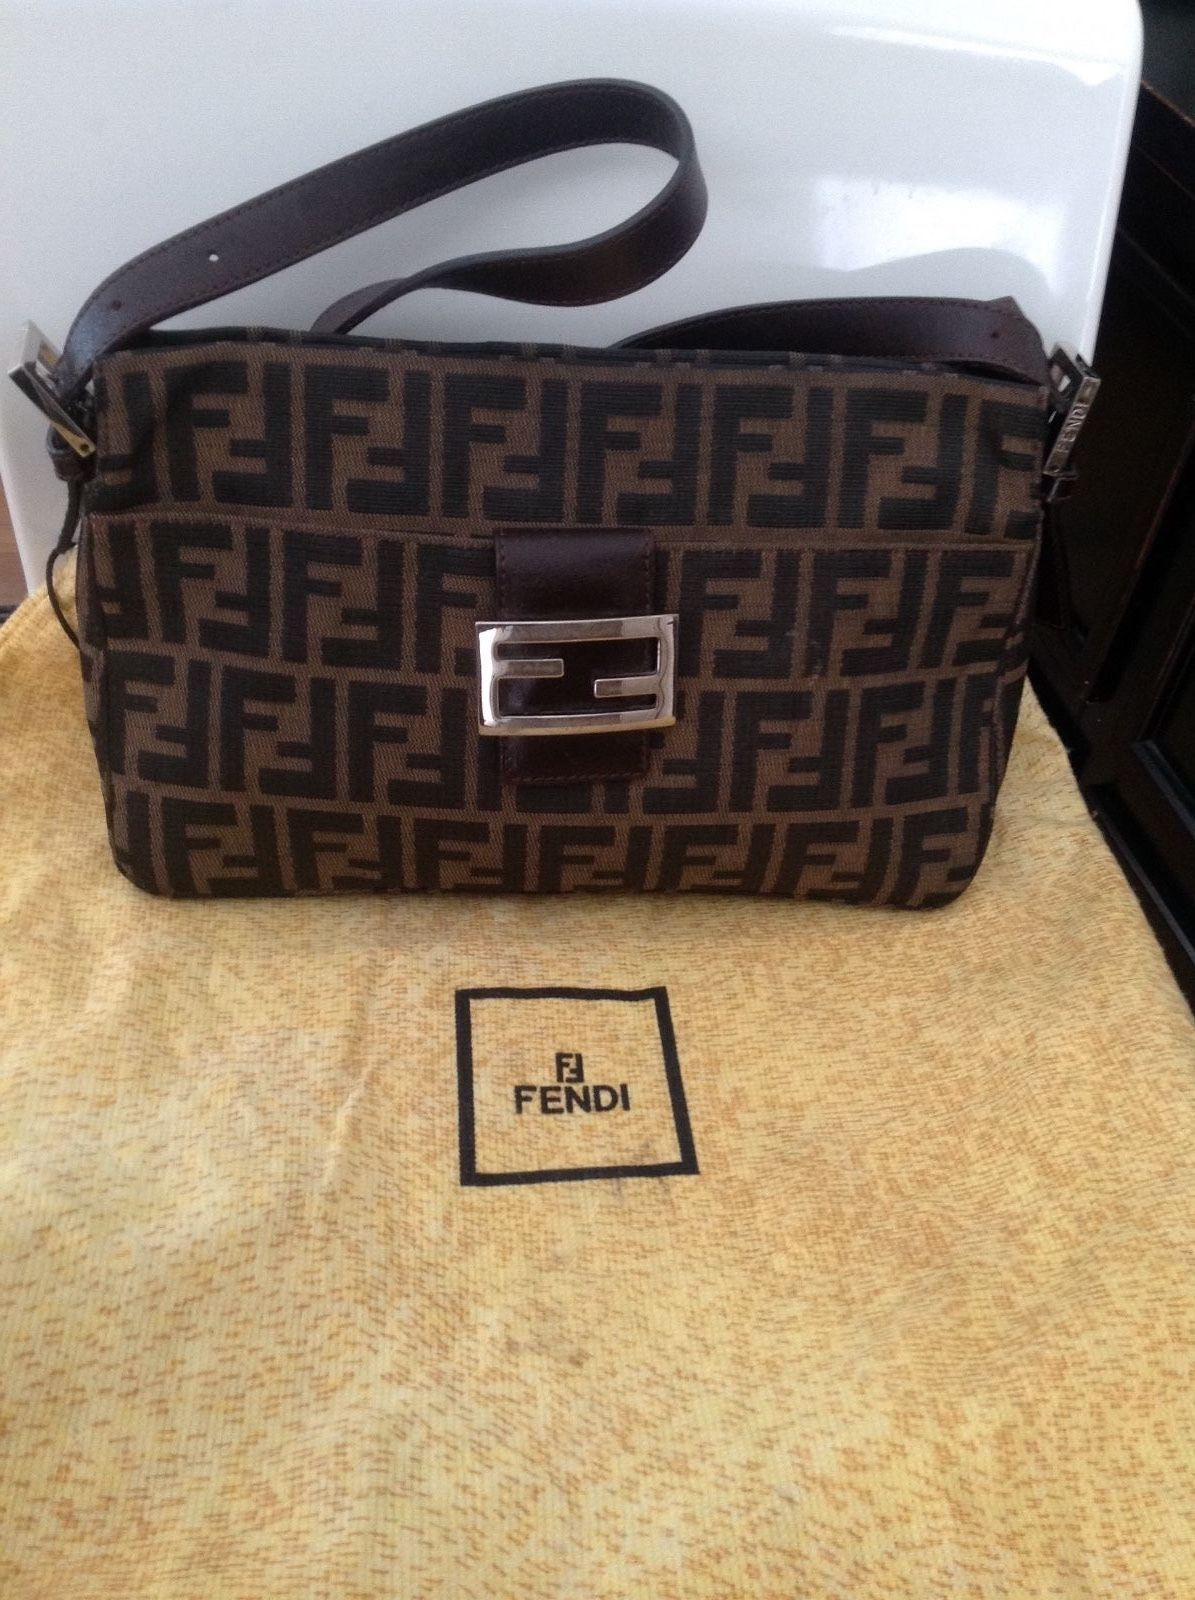 d1cb45317e3 ... authentic auth fendi zucca monogram signature purse original dust bag  vgc brown nero med 158.39 bd9a7 ...